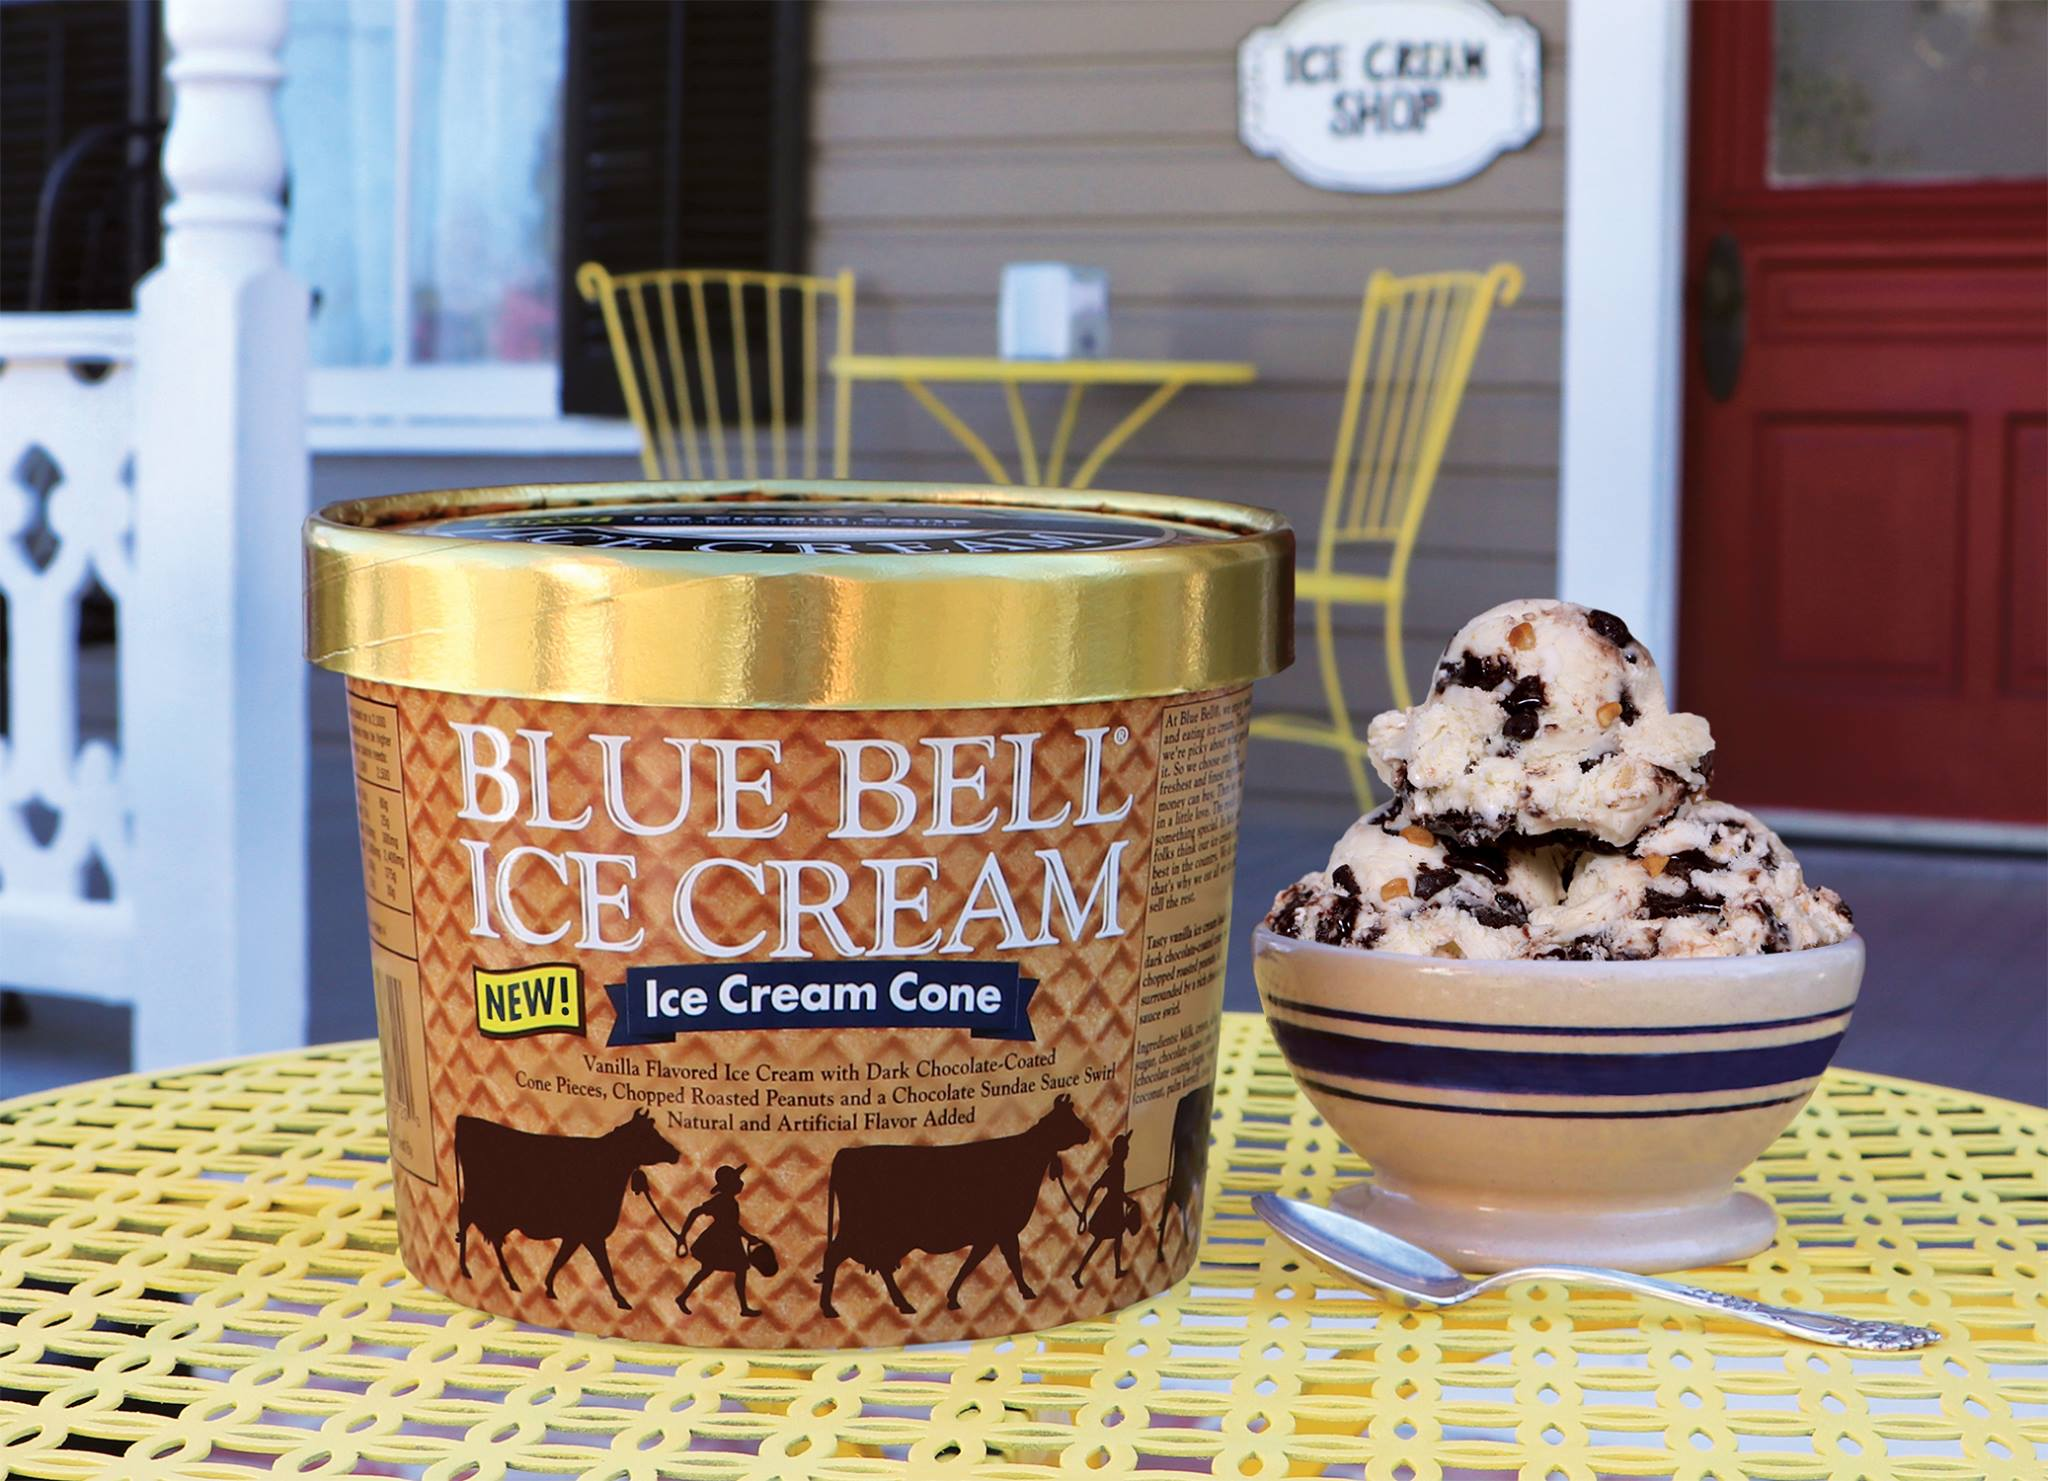 Blue Bell Ice Cream's new flavor